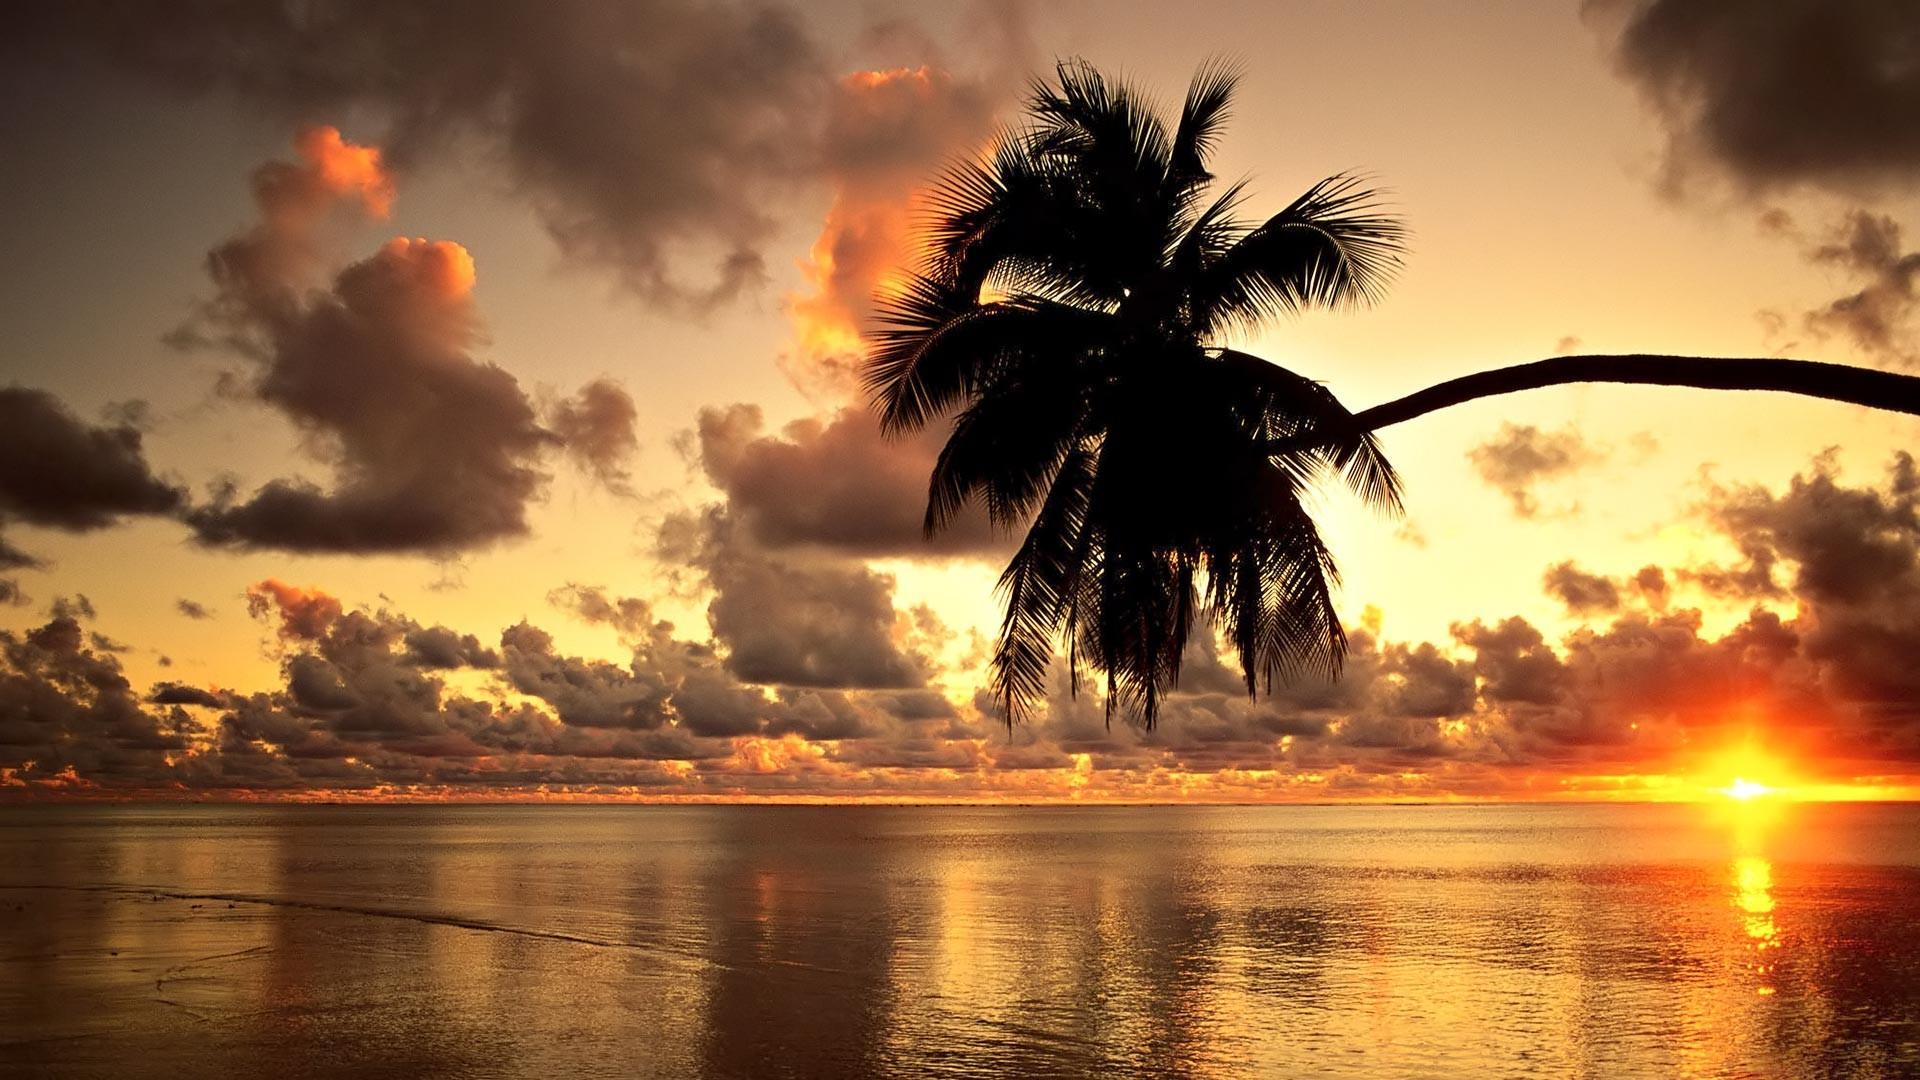 Res: 1920x1080, ---ocean-sunset-wallpapers-5040